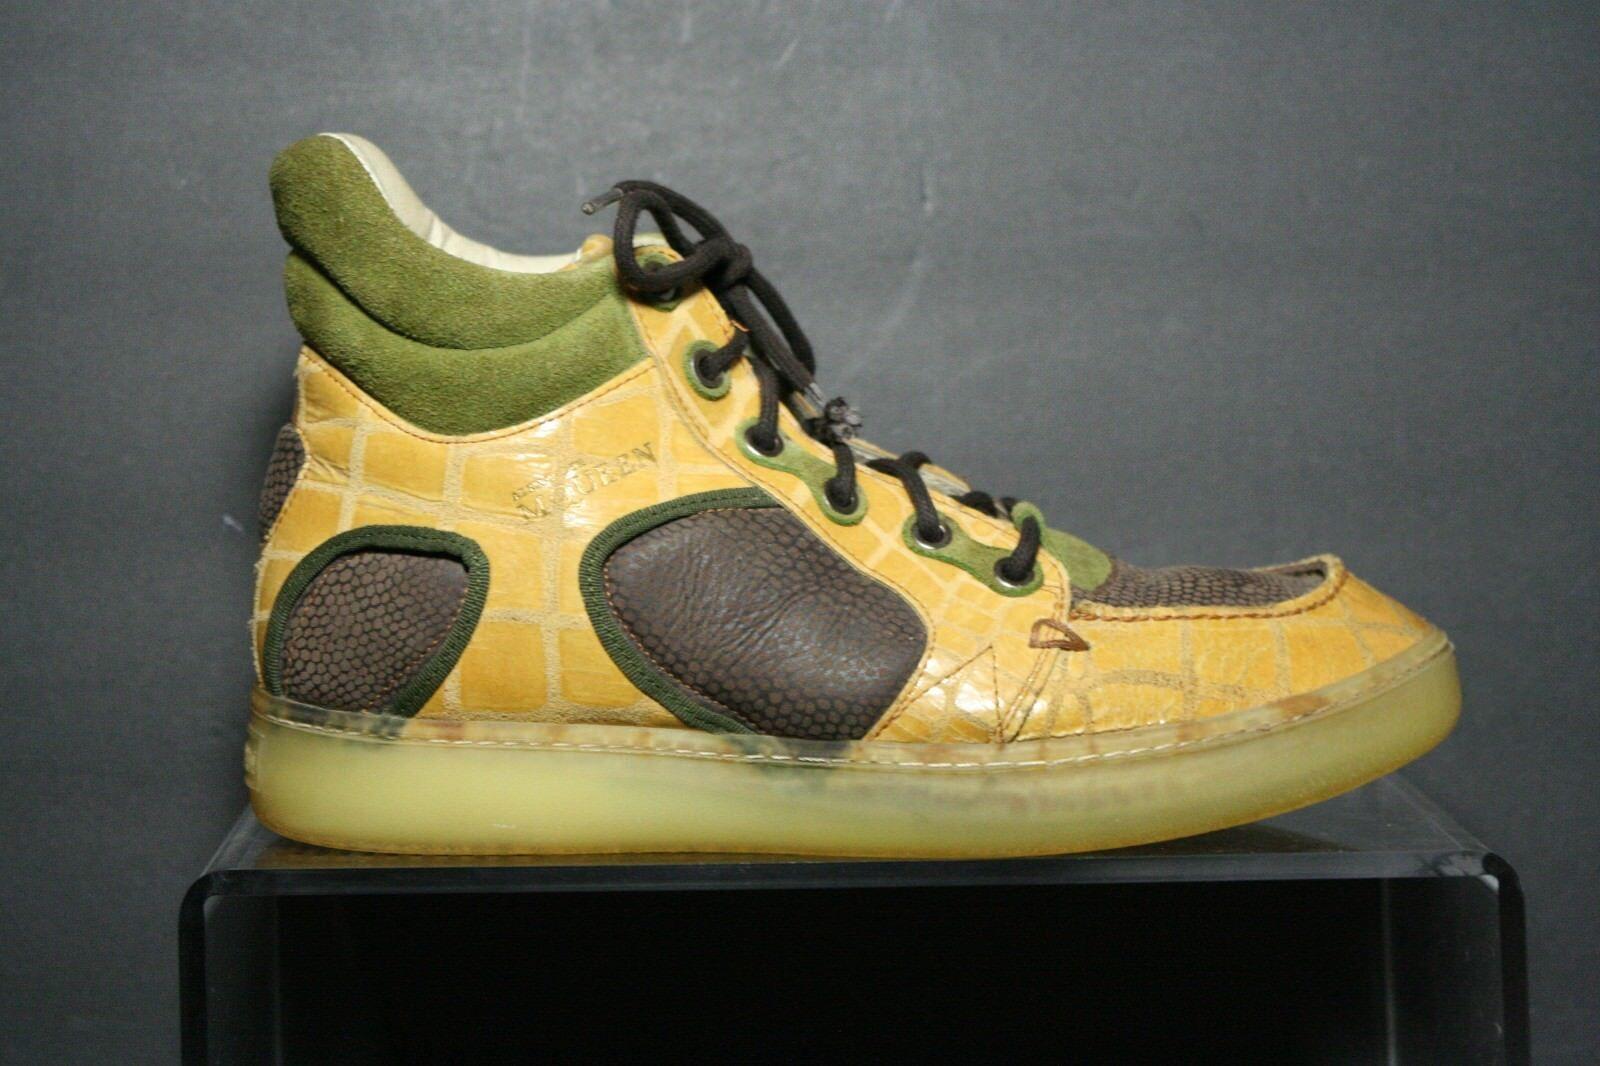 Puma Alexander McQueen Joust III High Men 9 Multi Athletic Leather Hipster Croc